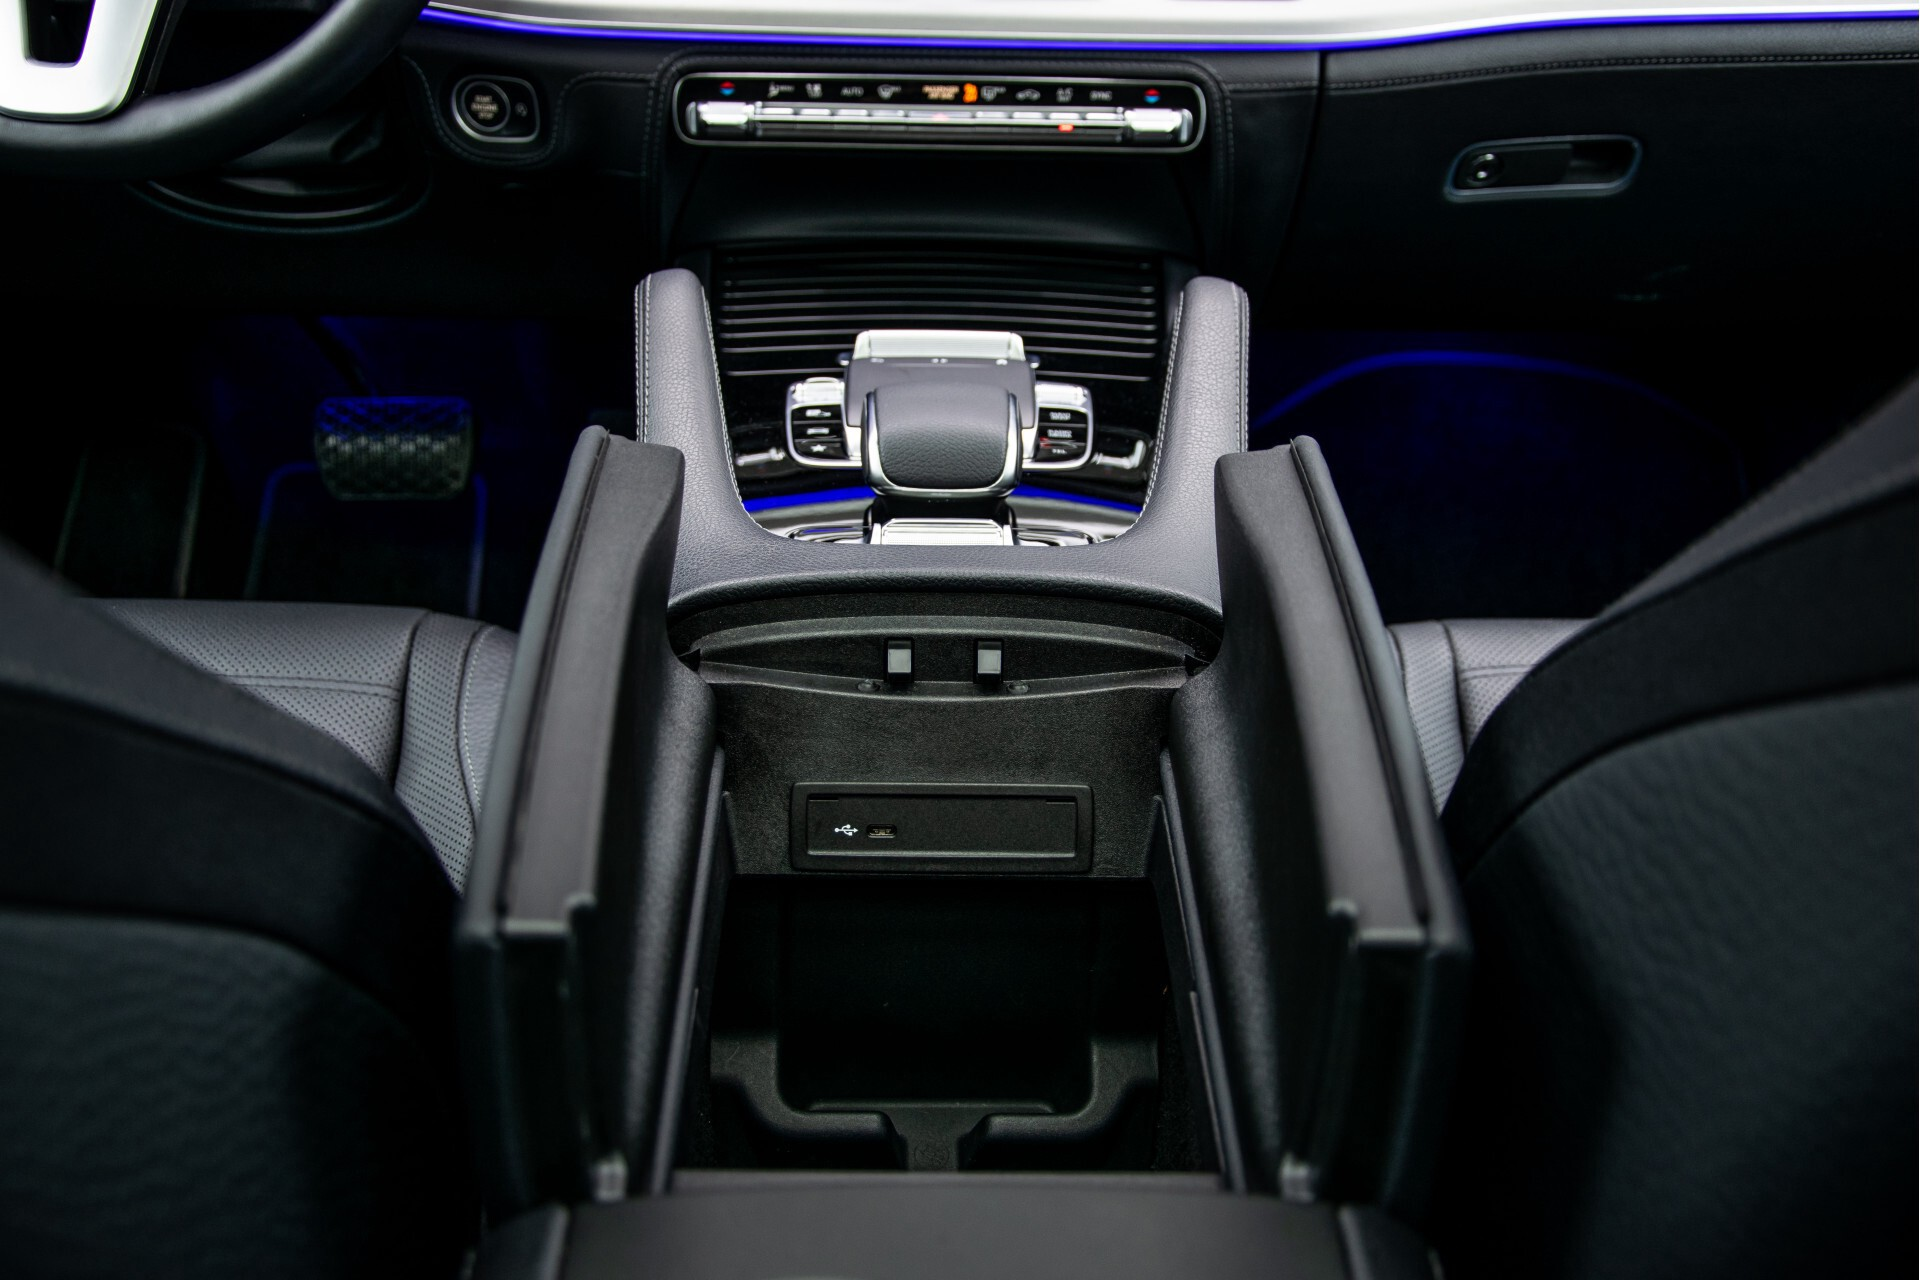 Mercedes-Benz GLE 450 4-M 7-Persoons AMG Massage/Rij-assist/Keyless/TV/360/Night/Trekhaak Aut9 Foto 43